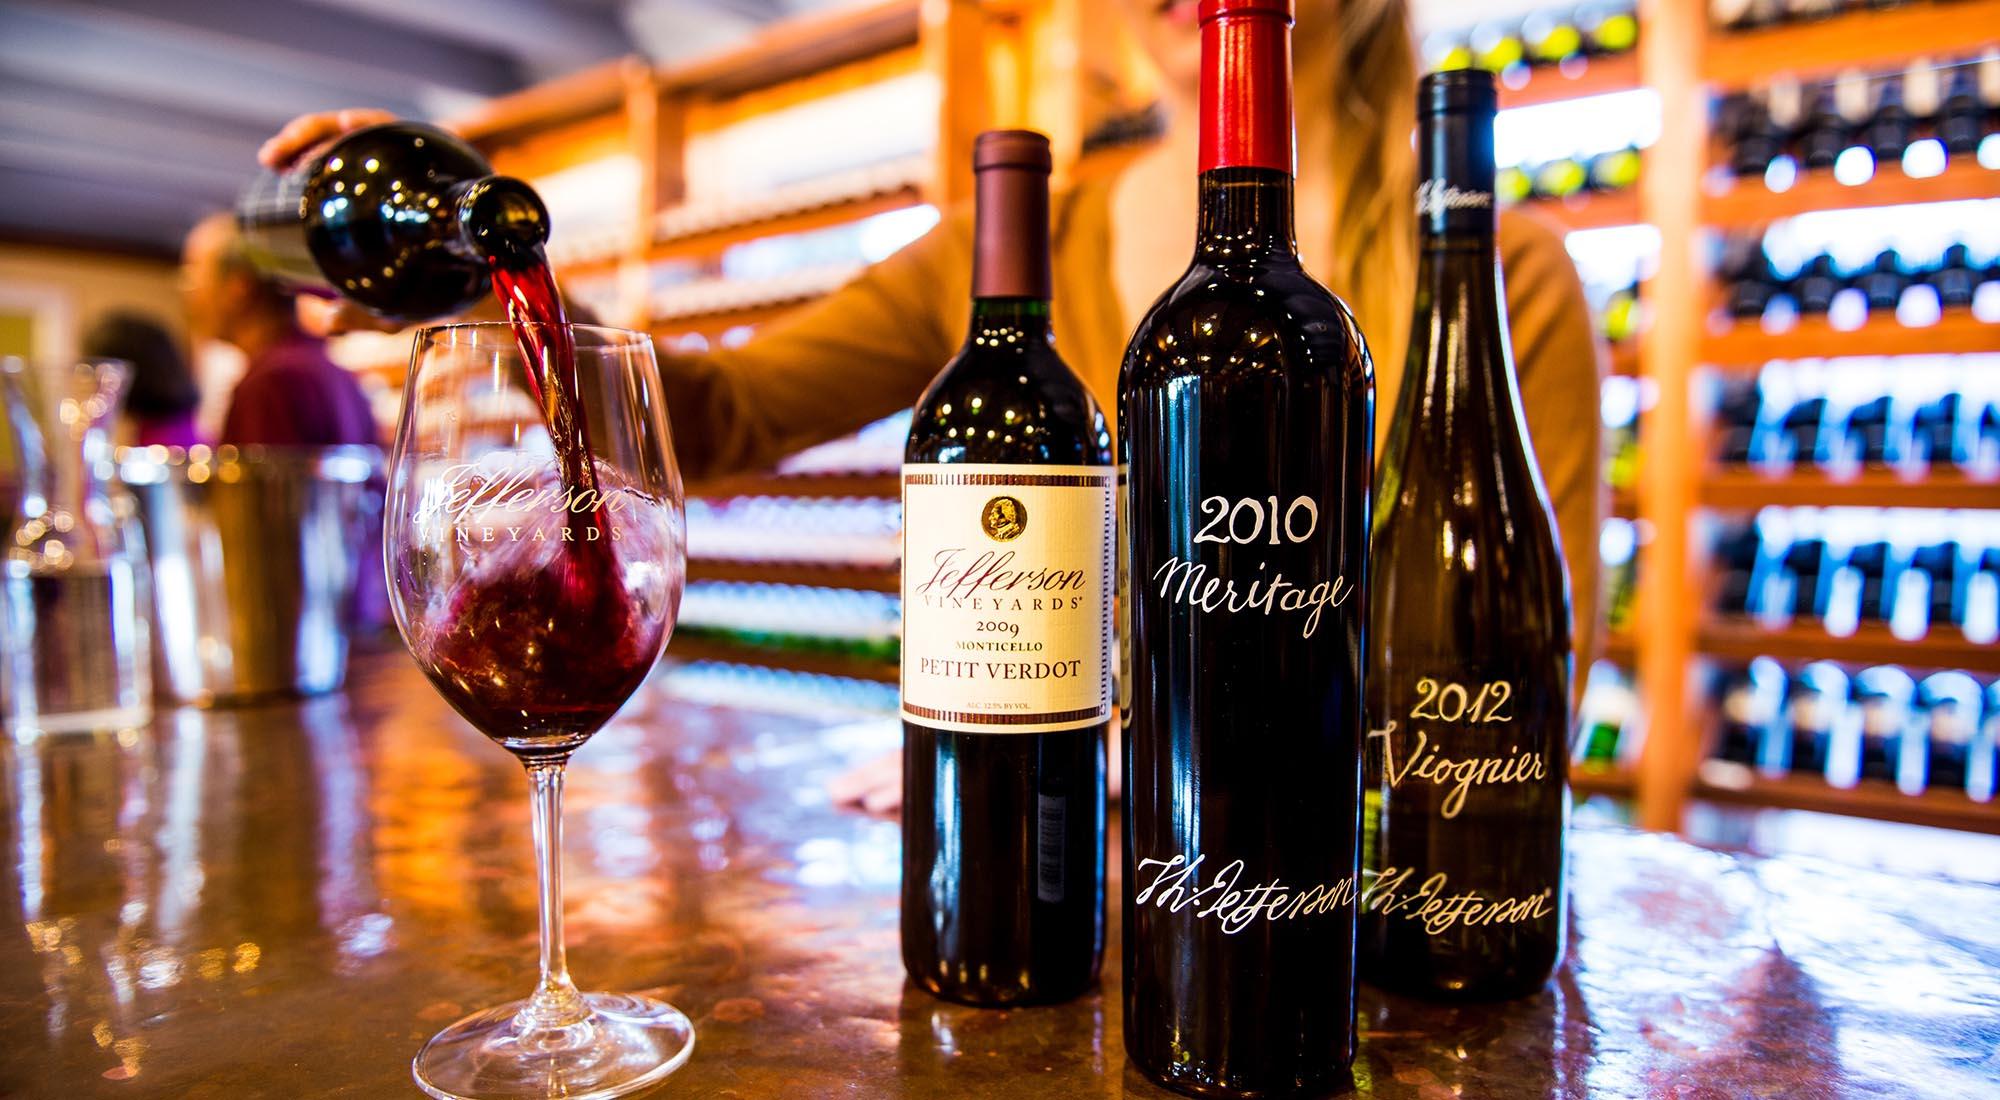 Jefferson Vineyards